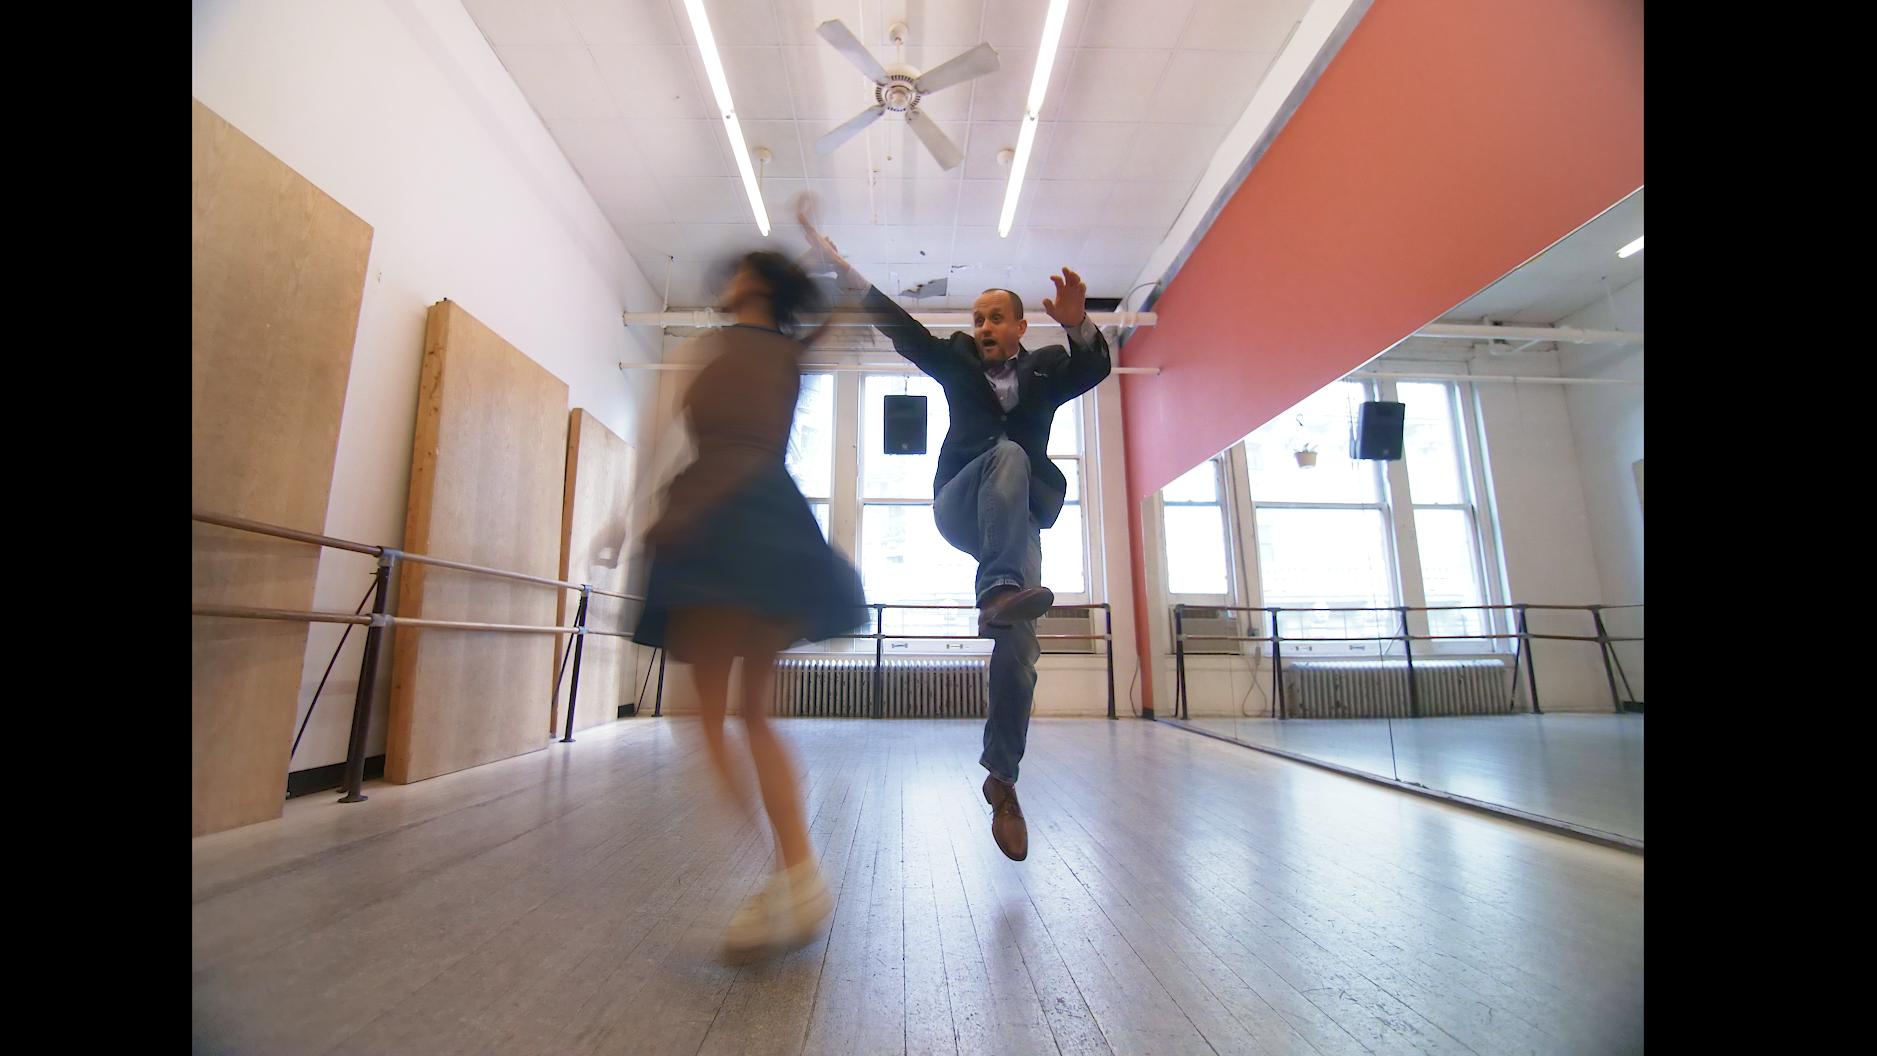 New York City Swing Dance Group